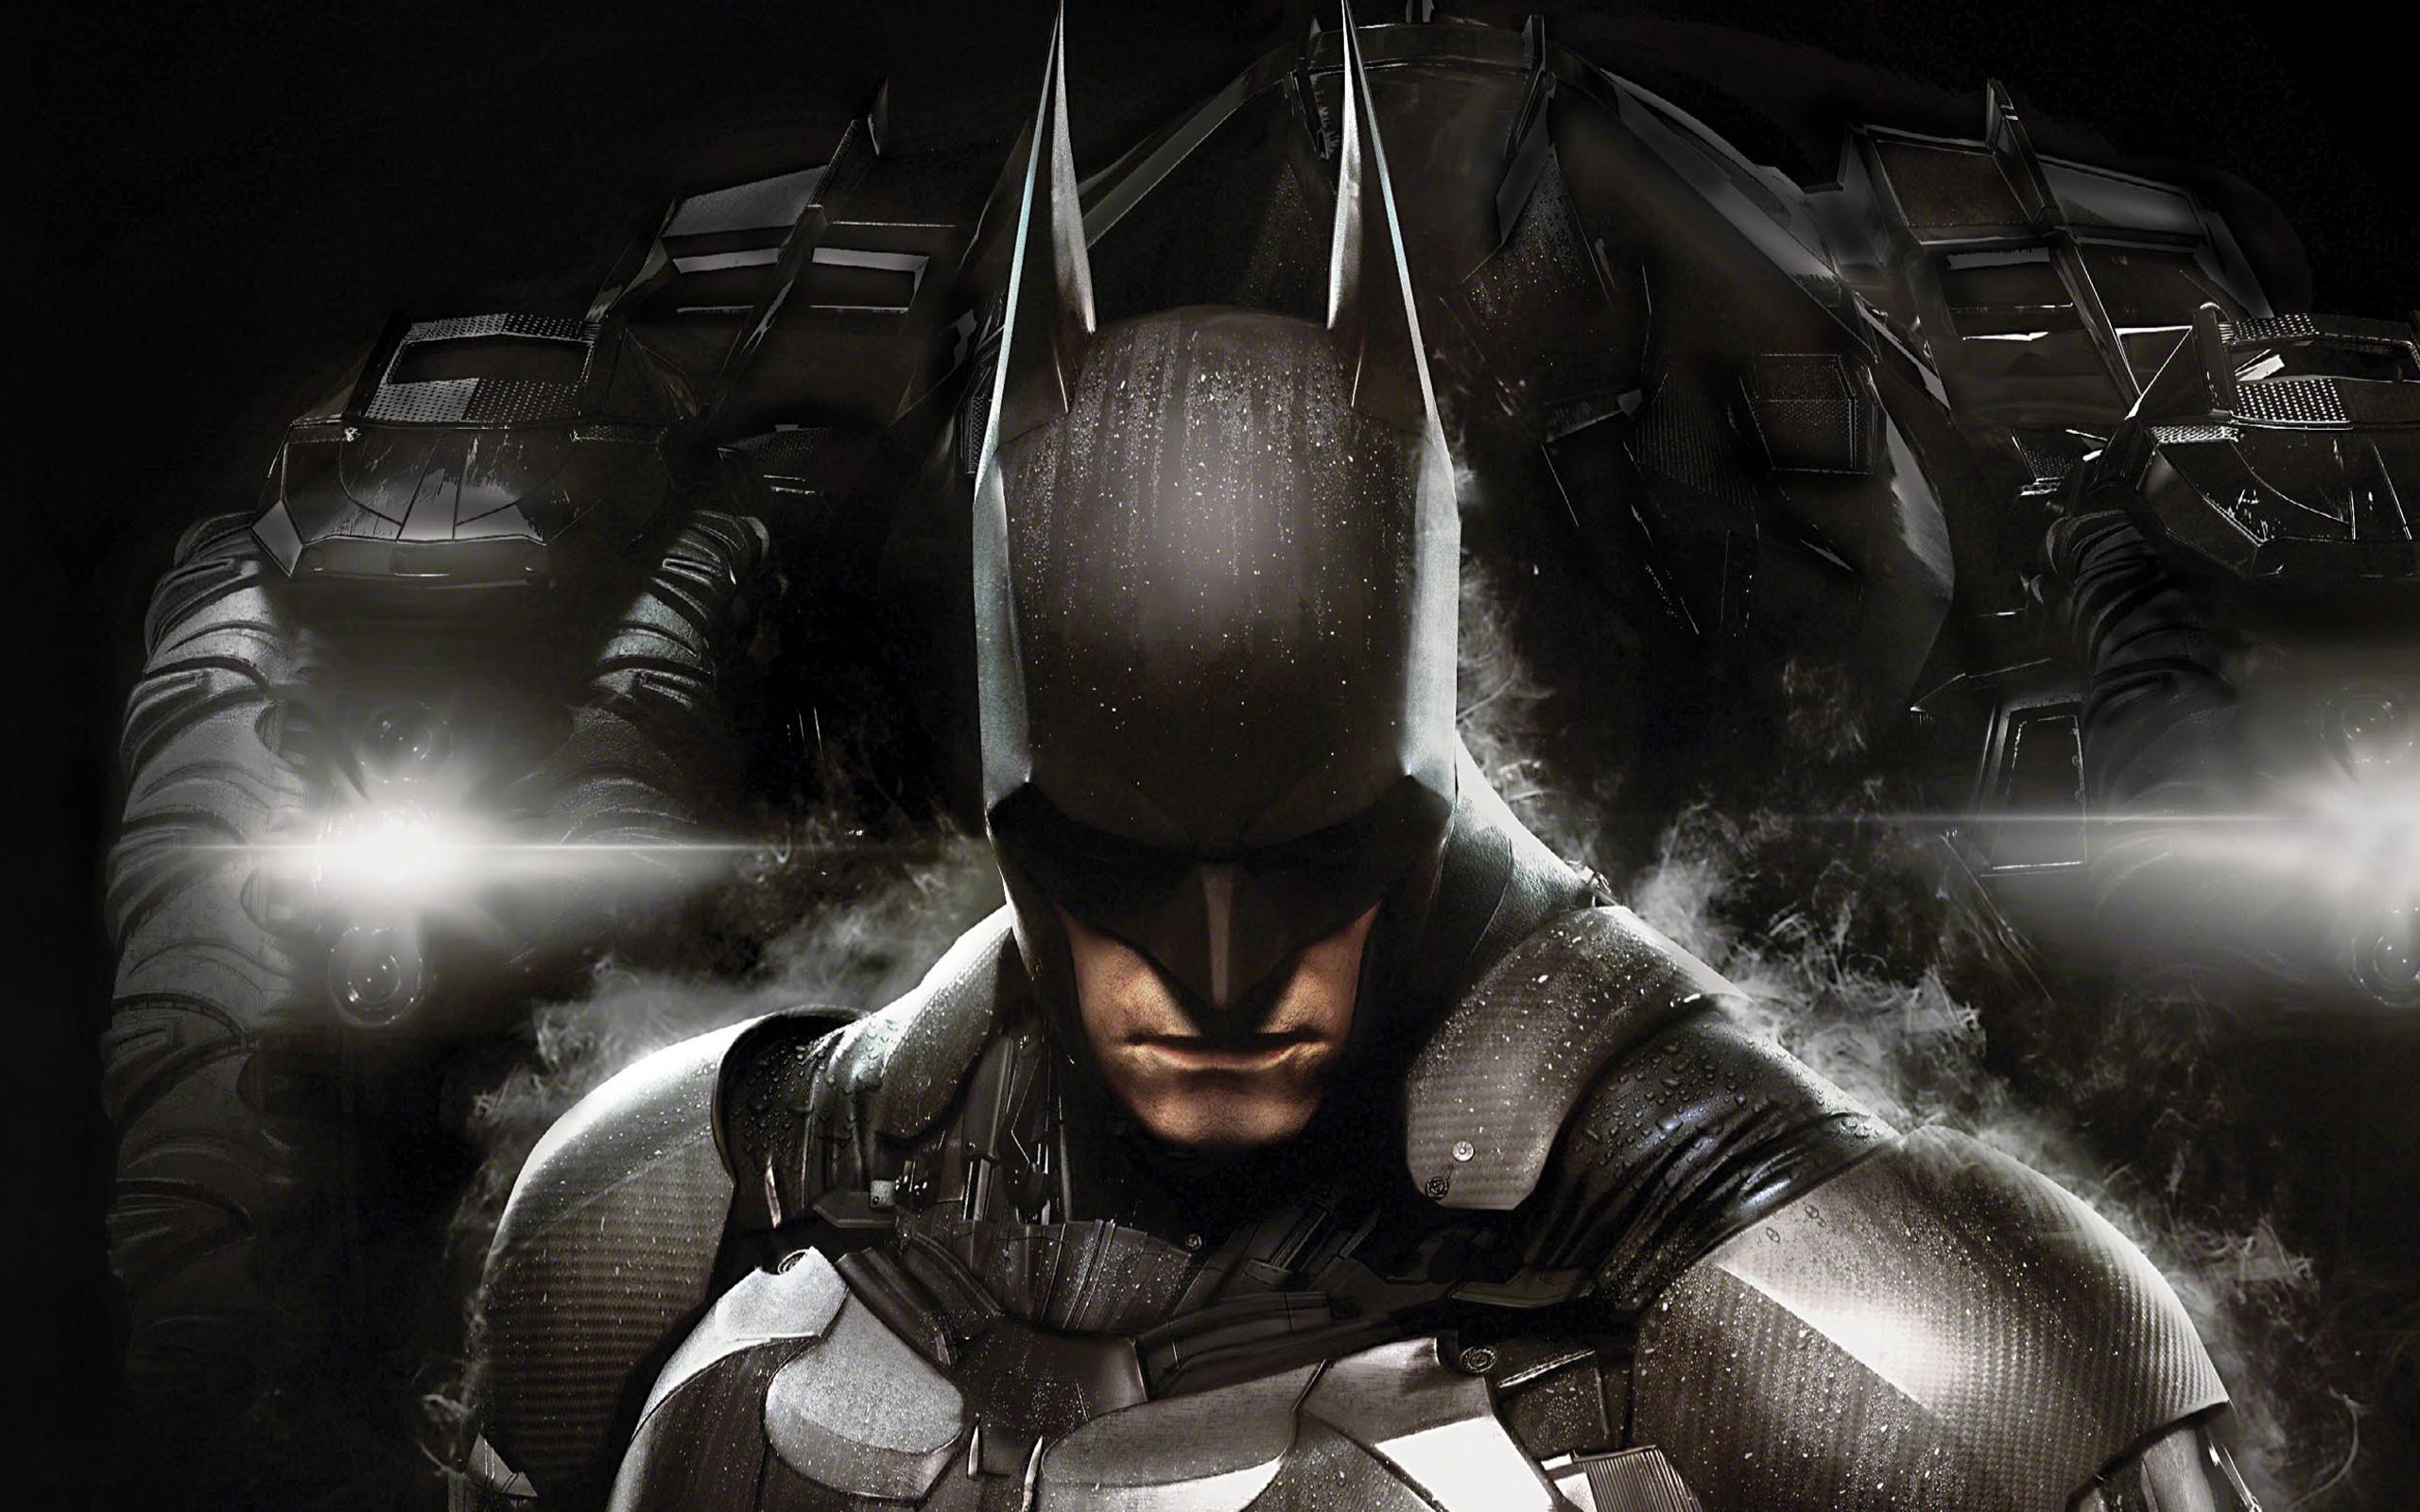 2014 Batman Arkham Knight Wallpapers HD Wallpapers 2560x1600